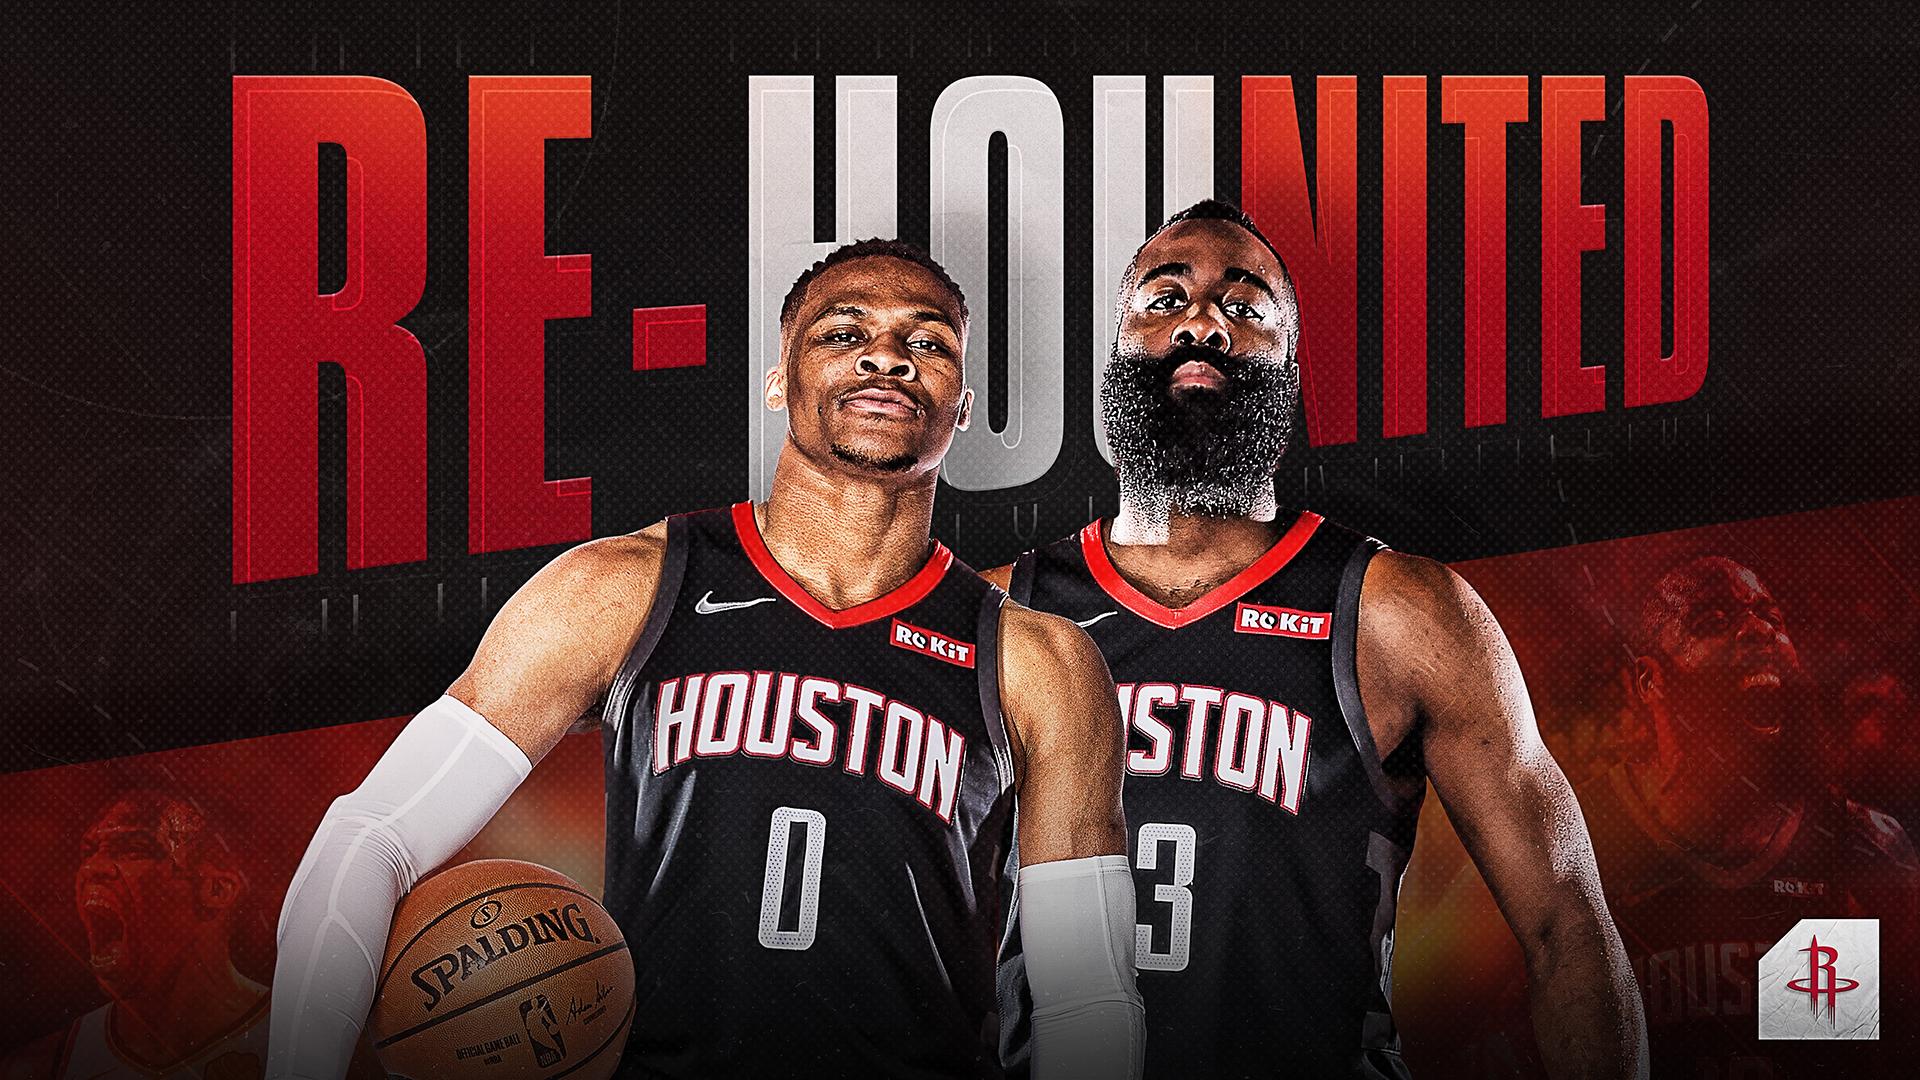 Nba Nike Wallpapers 2019: NBA 2020 Wallpapers